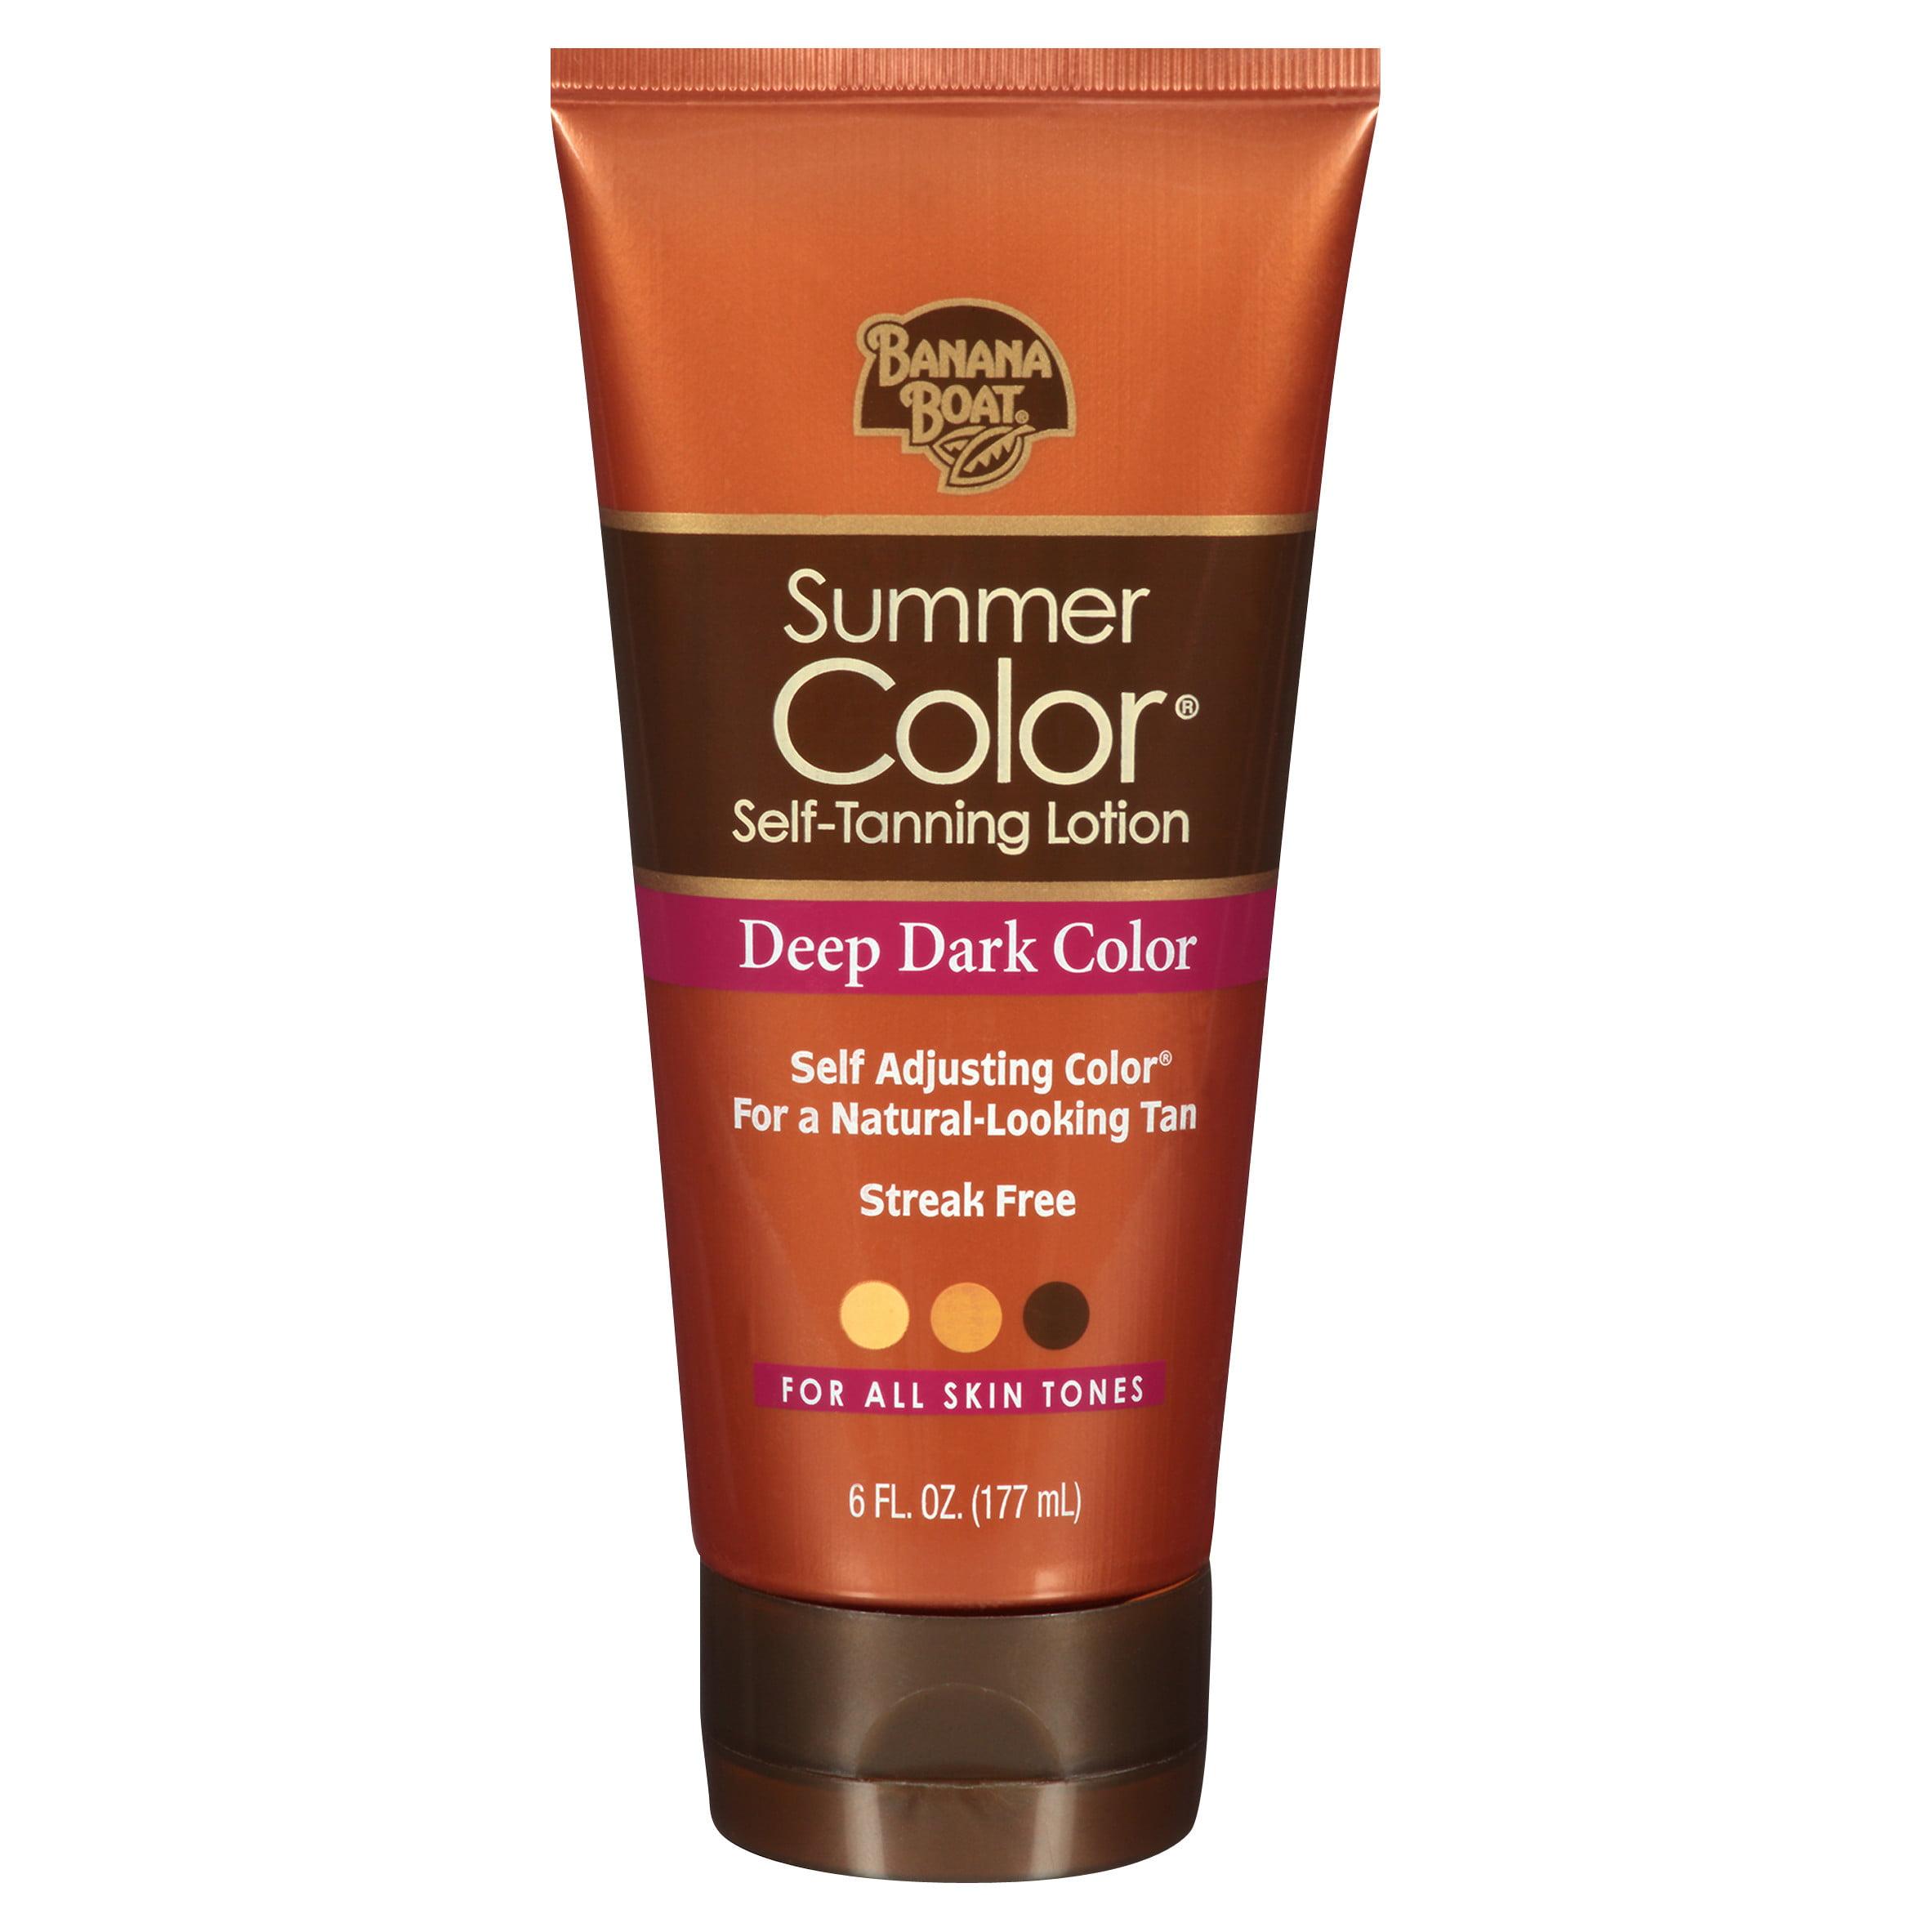 Banana Boat Summer Color Self-Tanning Lotion Deep Dark Color - 6 Ounces